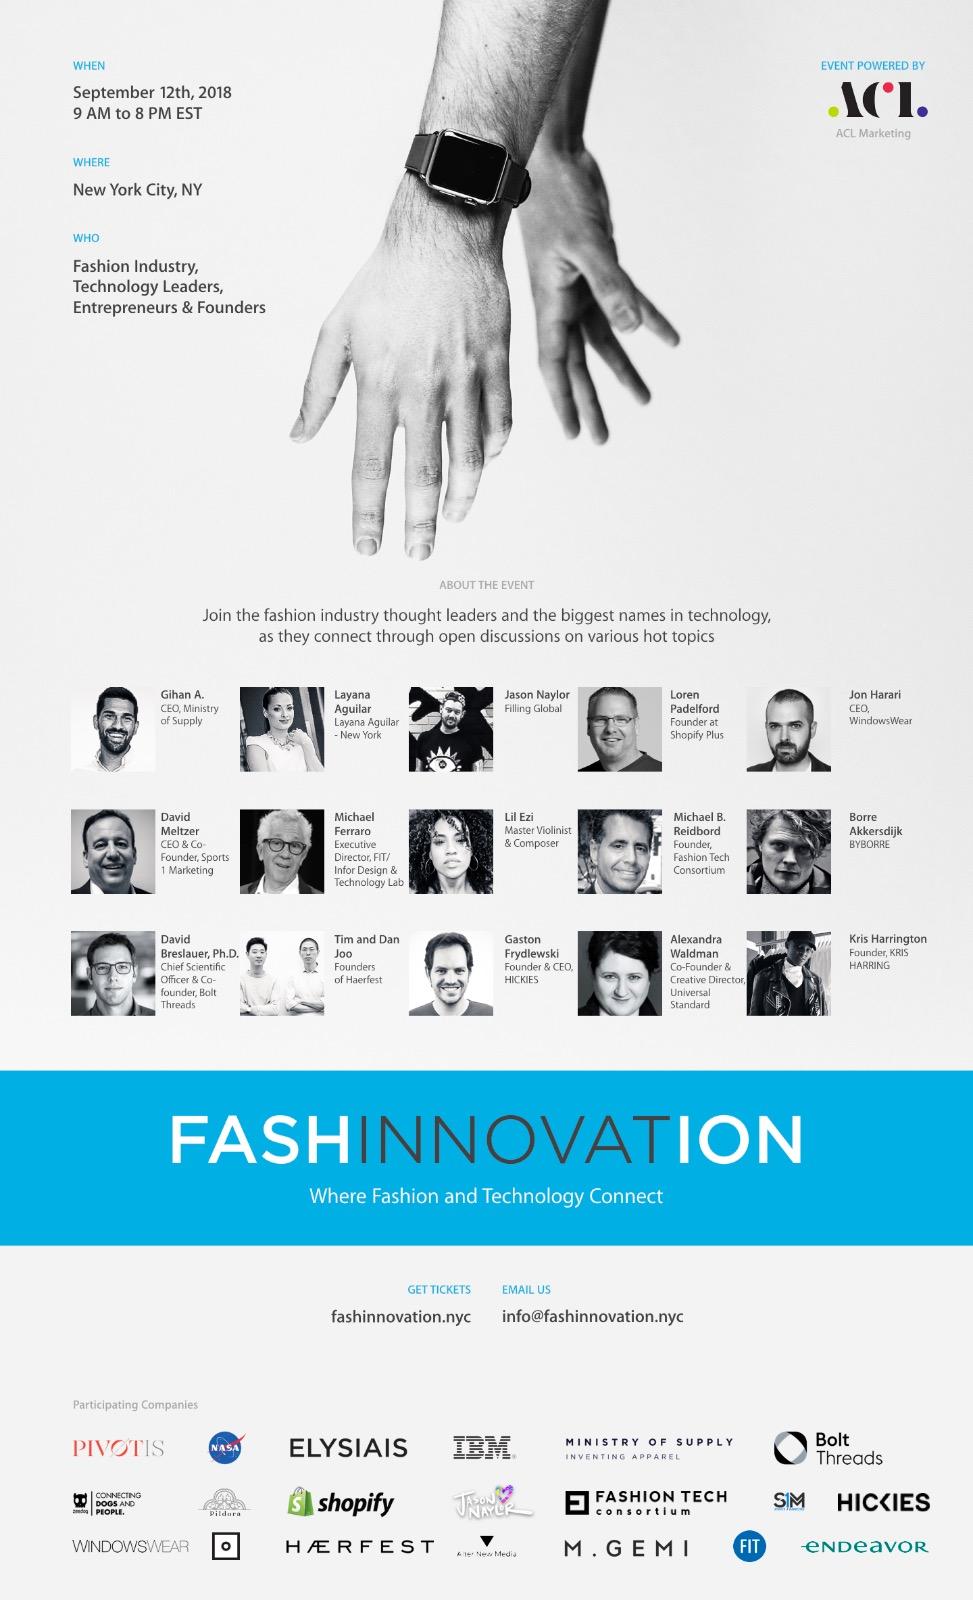 FashInnovation @ NY Fashion Week